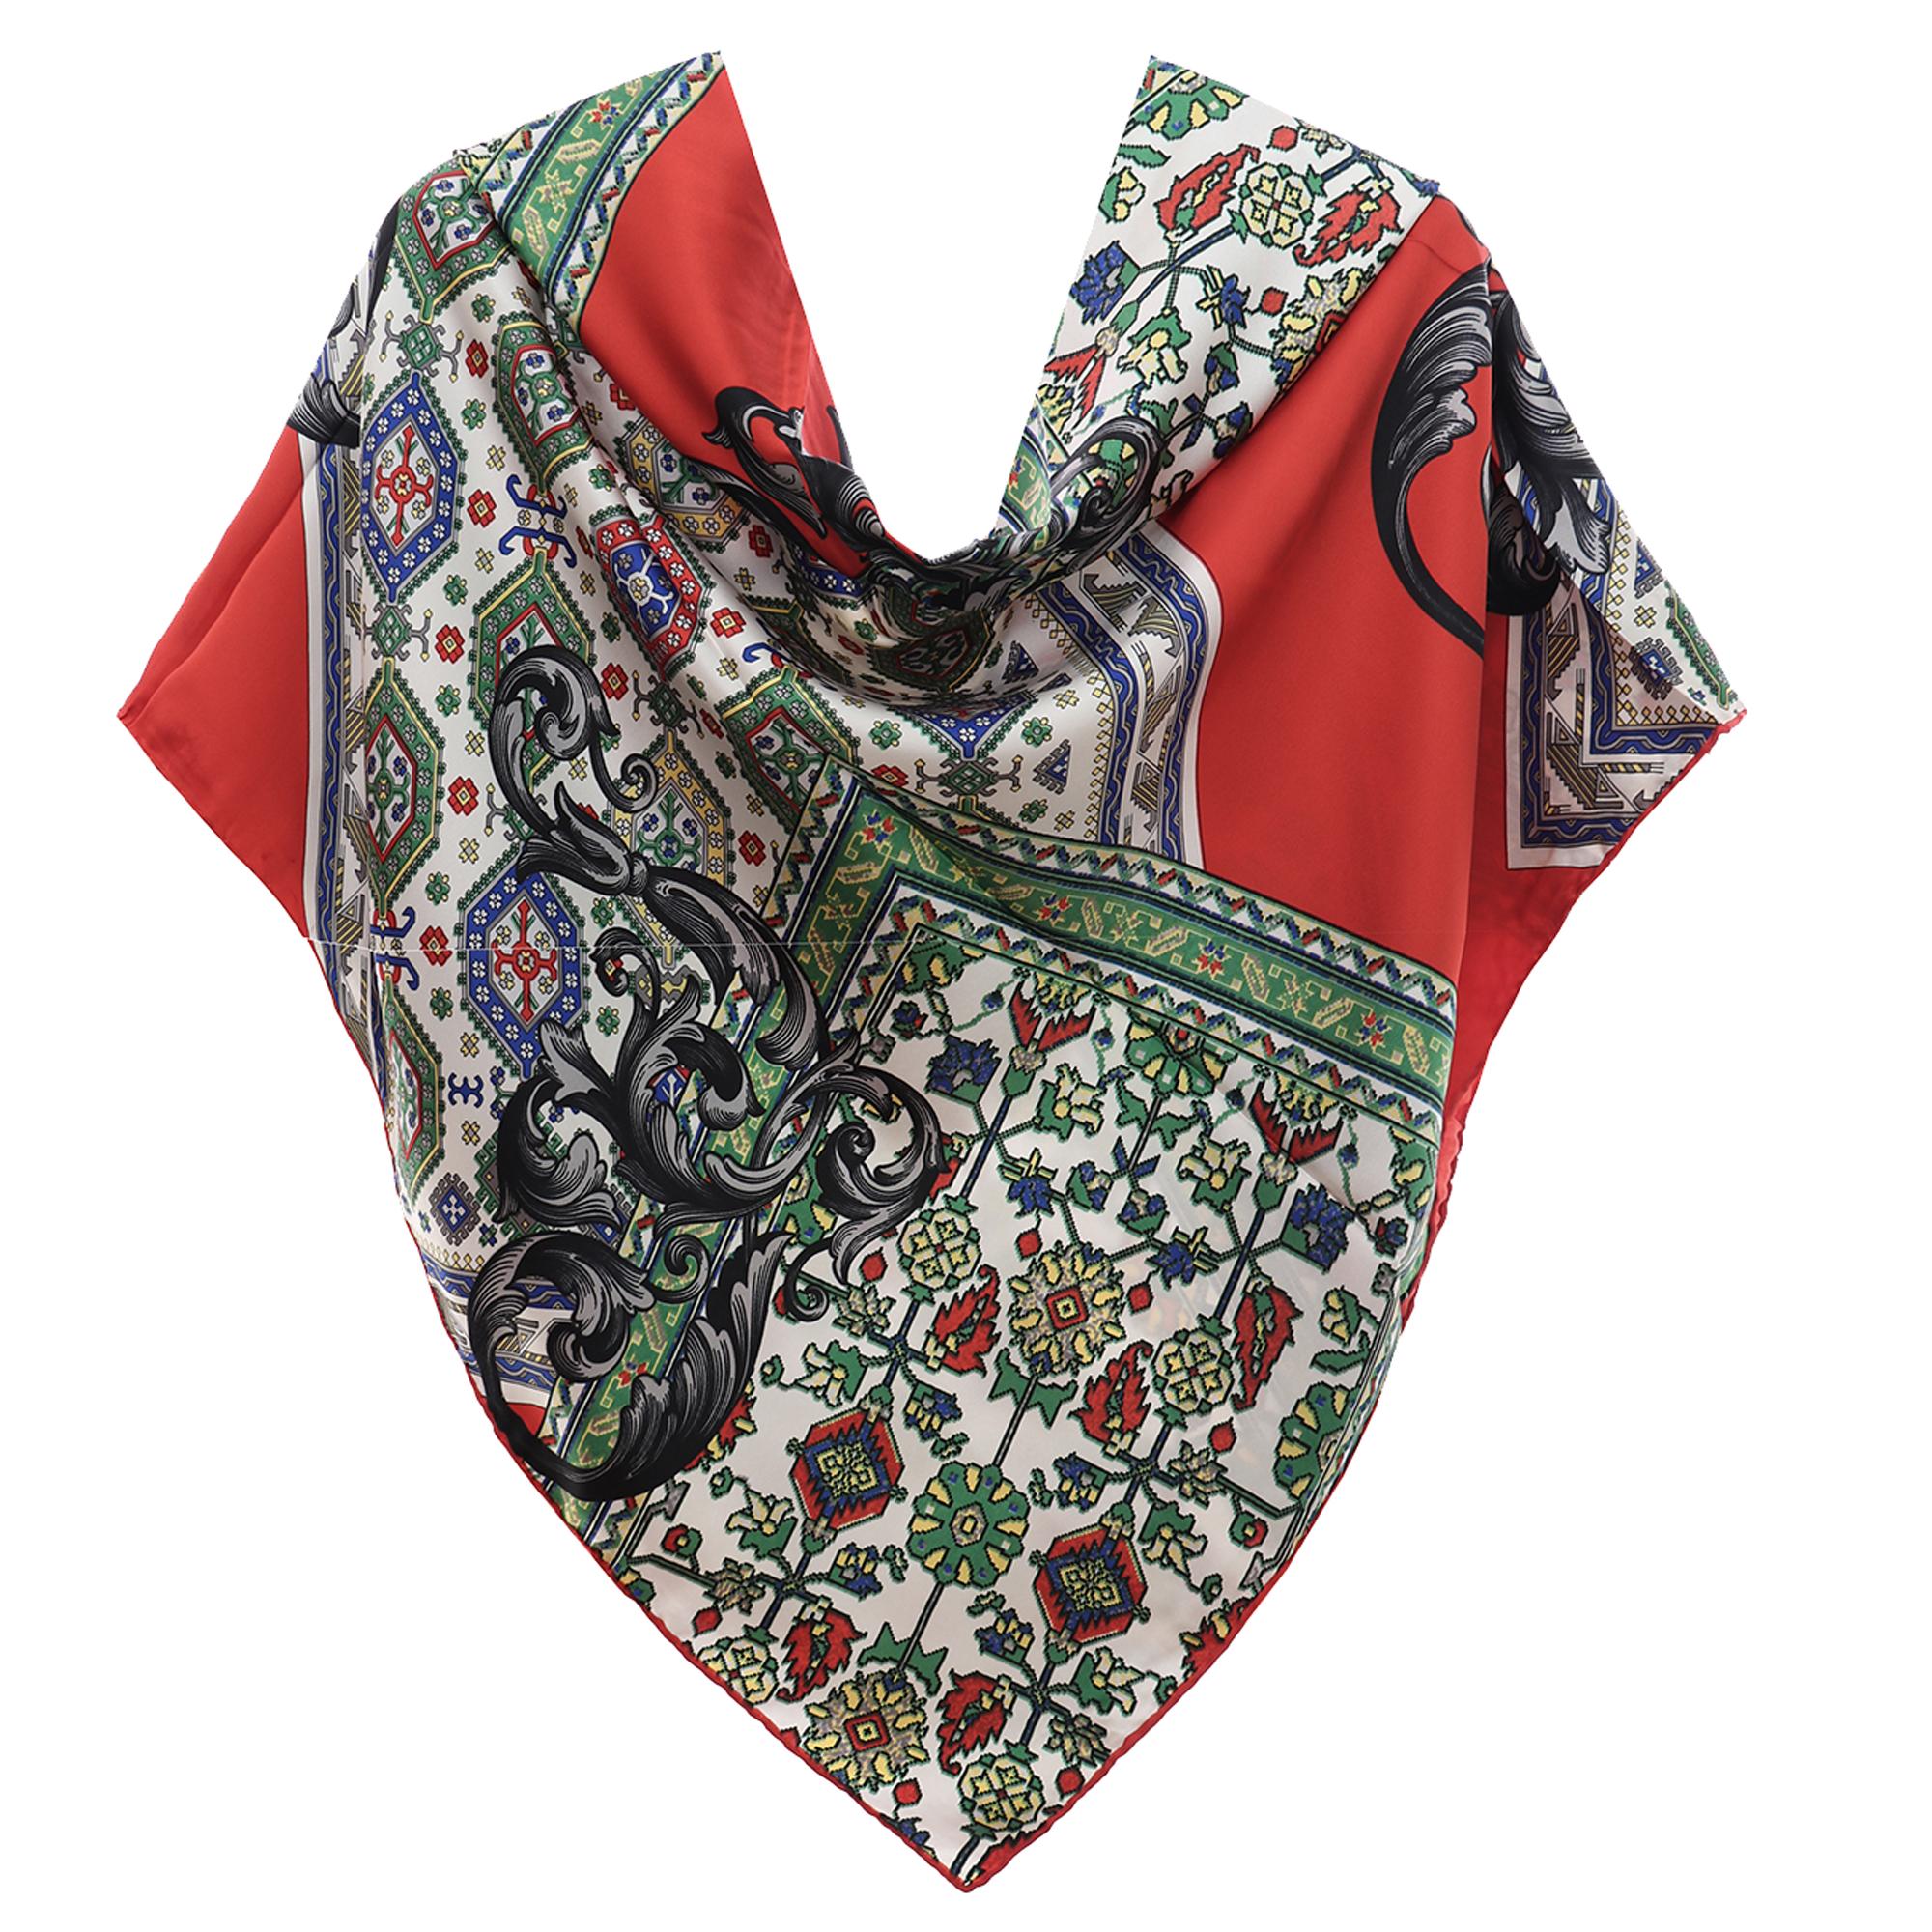 تصویر روسری زنانه کد tp-3874_58 تک سایز